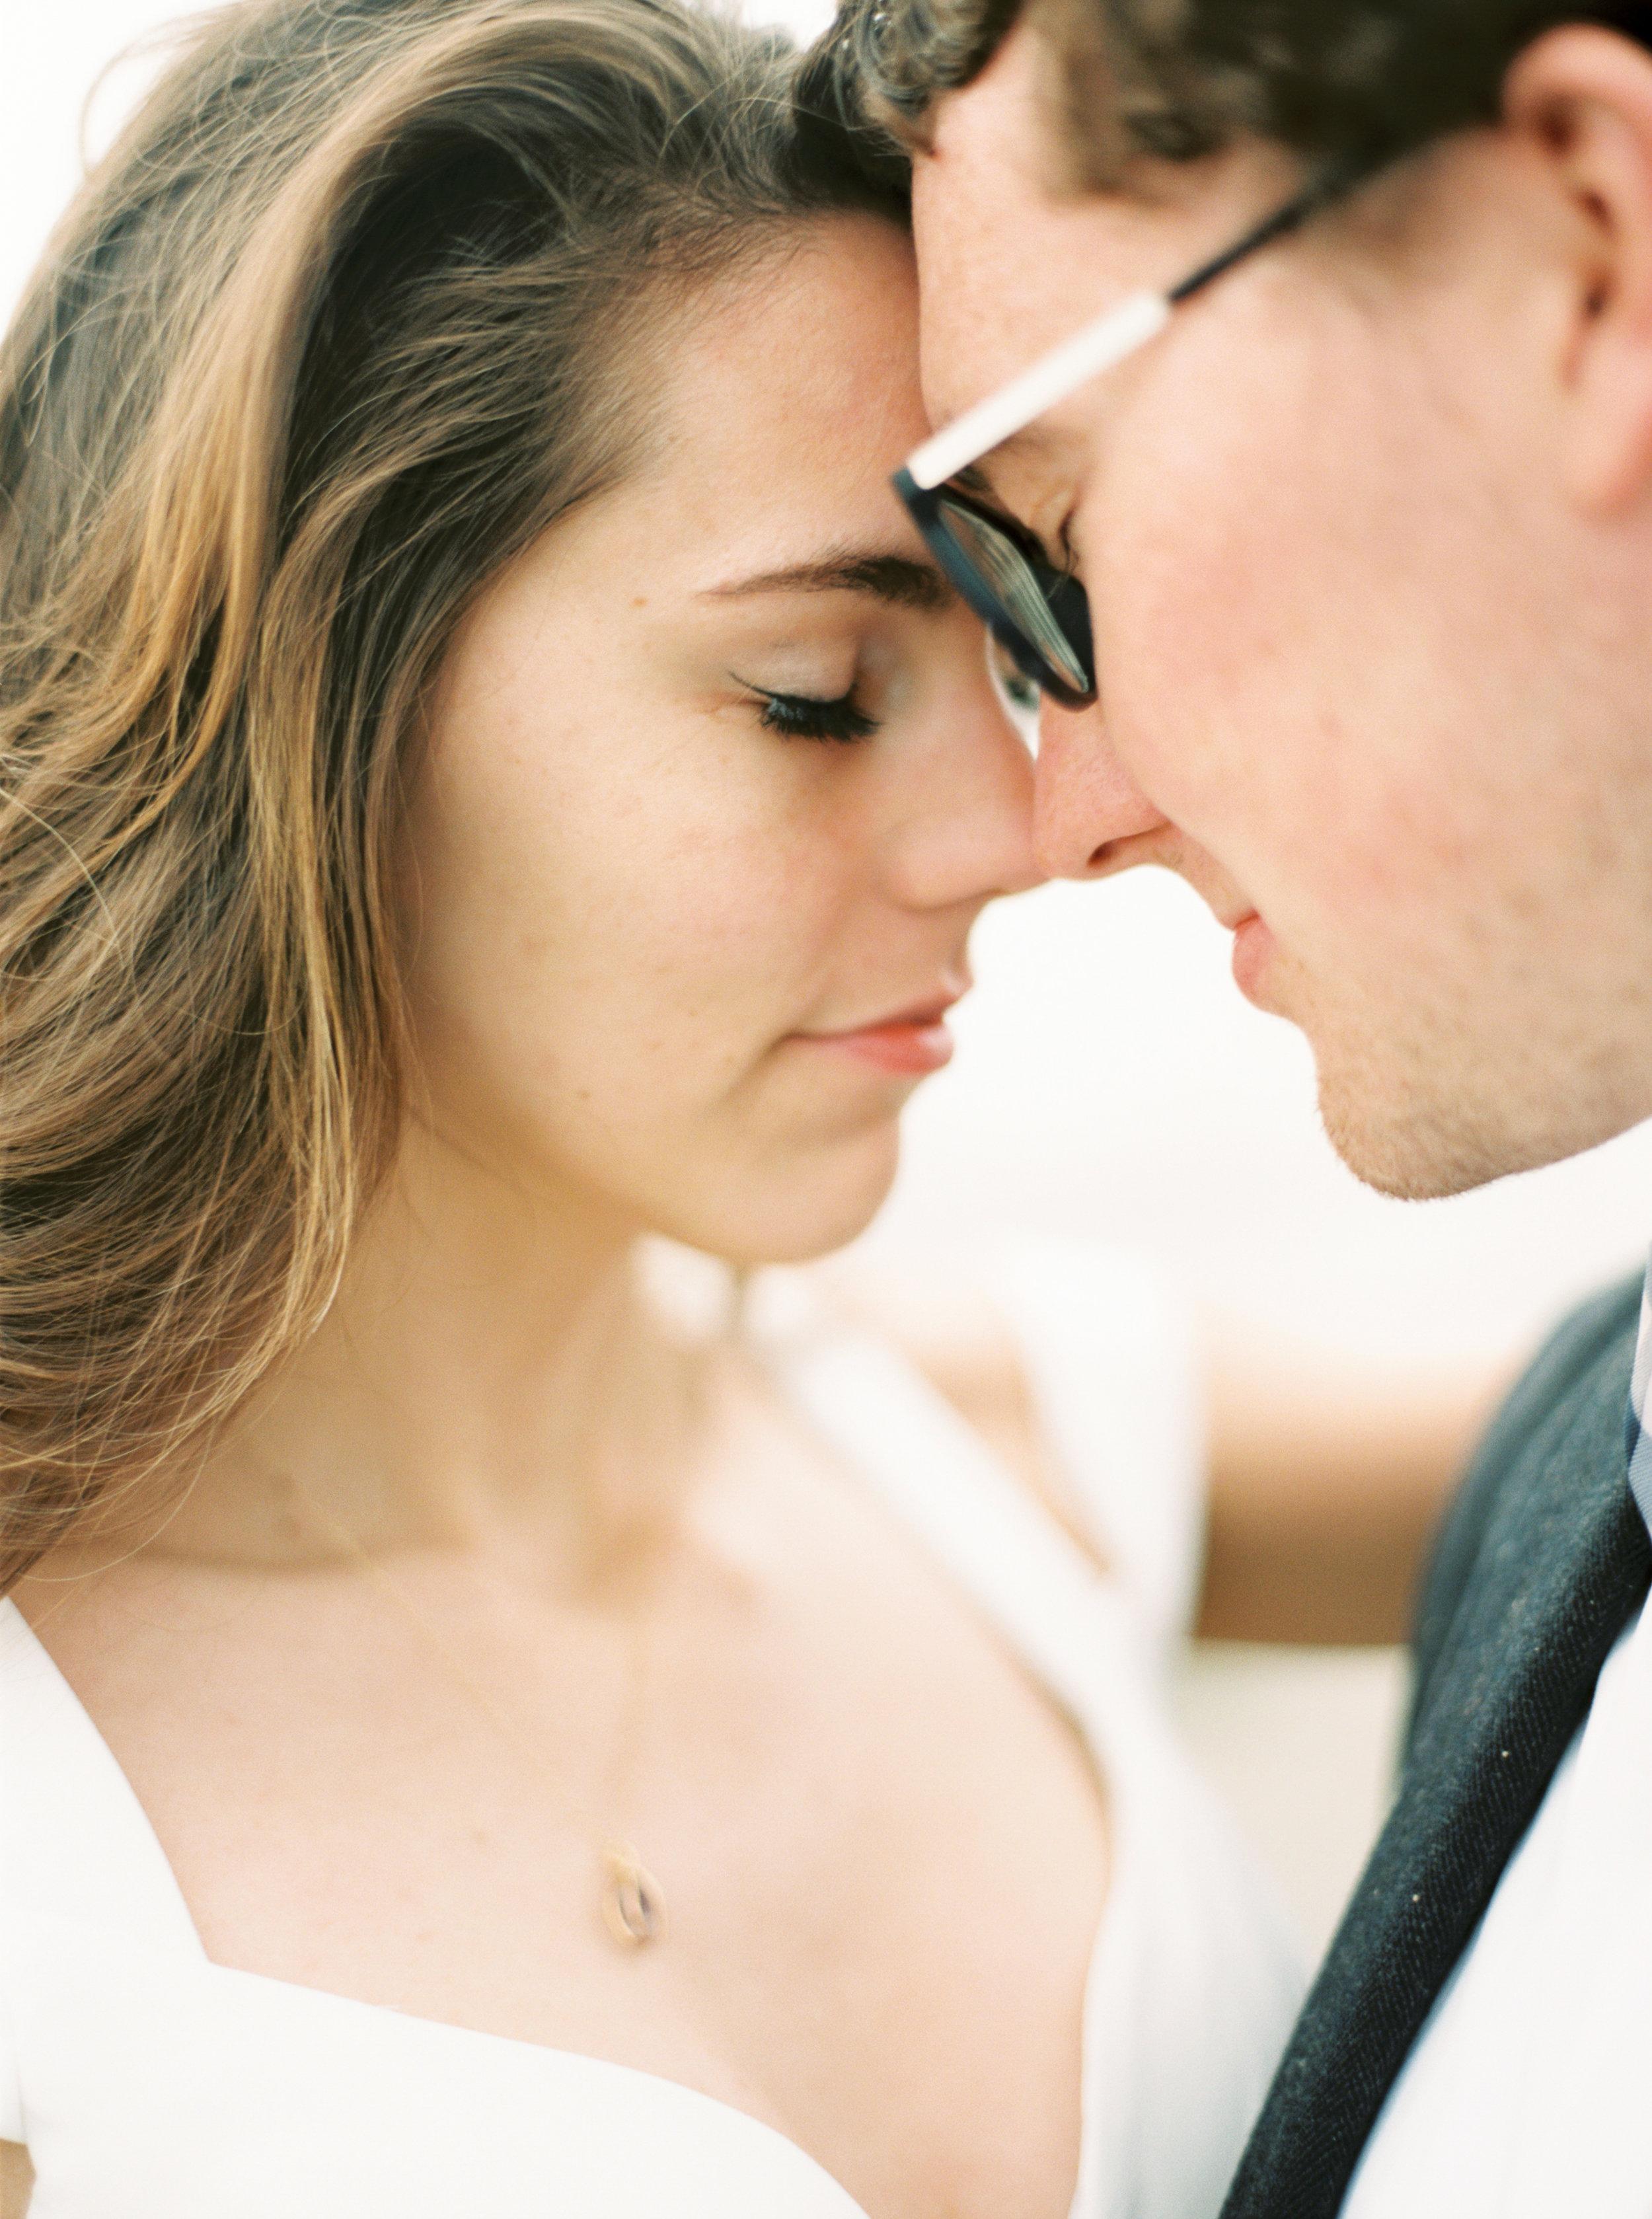 California_Wedding_Photography_Film_FallenPhotograhpy-51.jpg